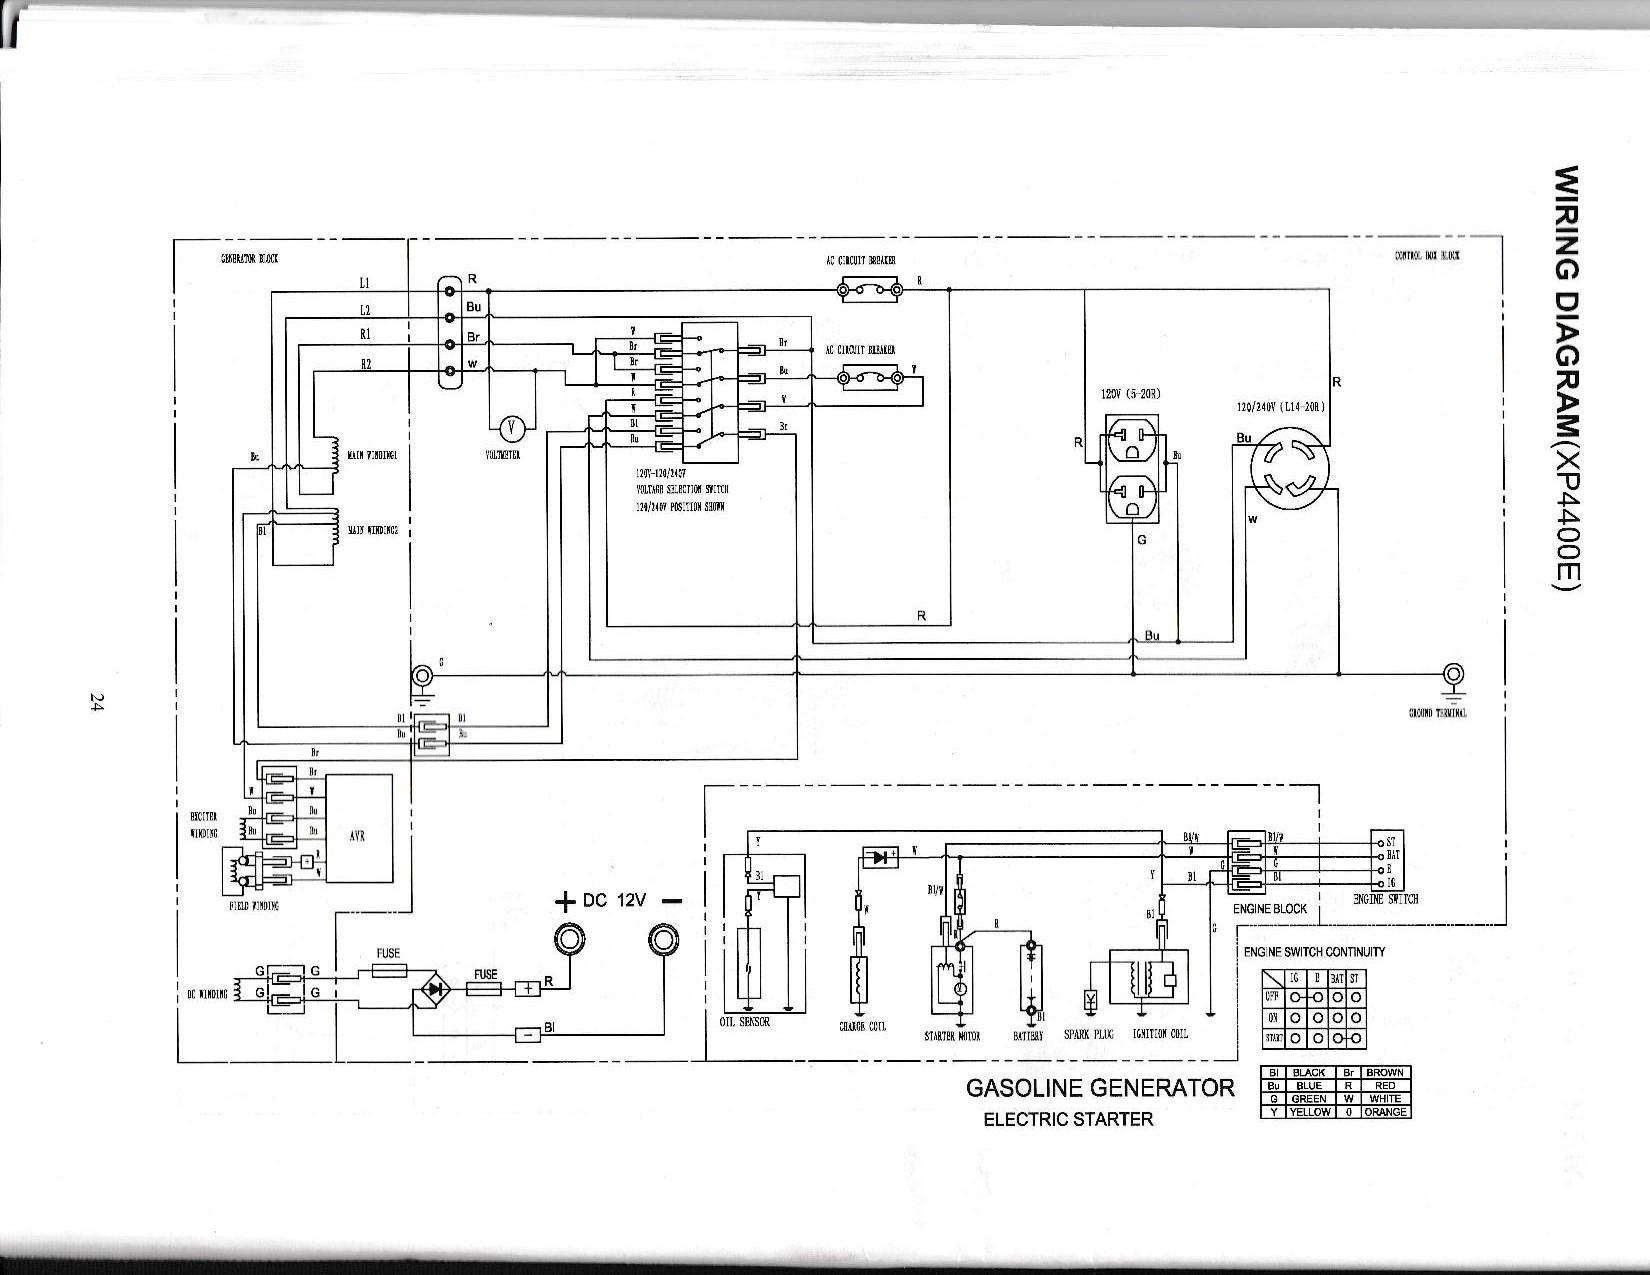 [DIAGRAM_1CA]  BO_7043] Help Viper 5901 Remote Start Installation Dodgetalk Dodge Car Schematic  Wiring   Delphi Remote Start Wiring Diagram      Subd Nuvit Atota Emba Mohammedshrine Librar Wiring 101